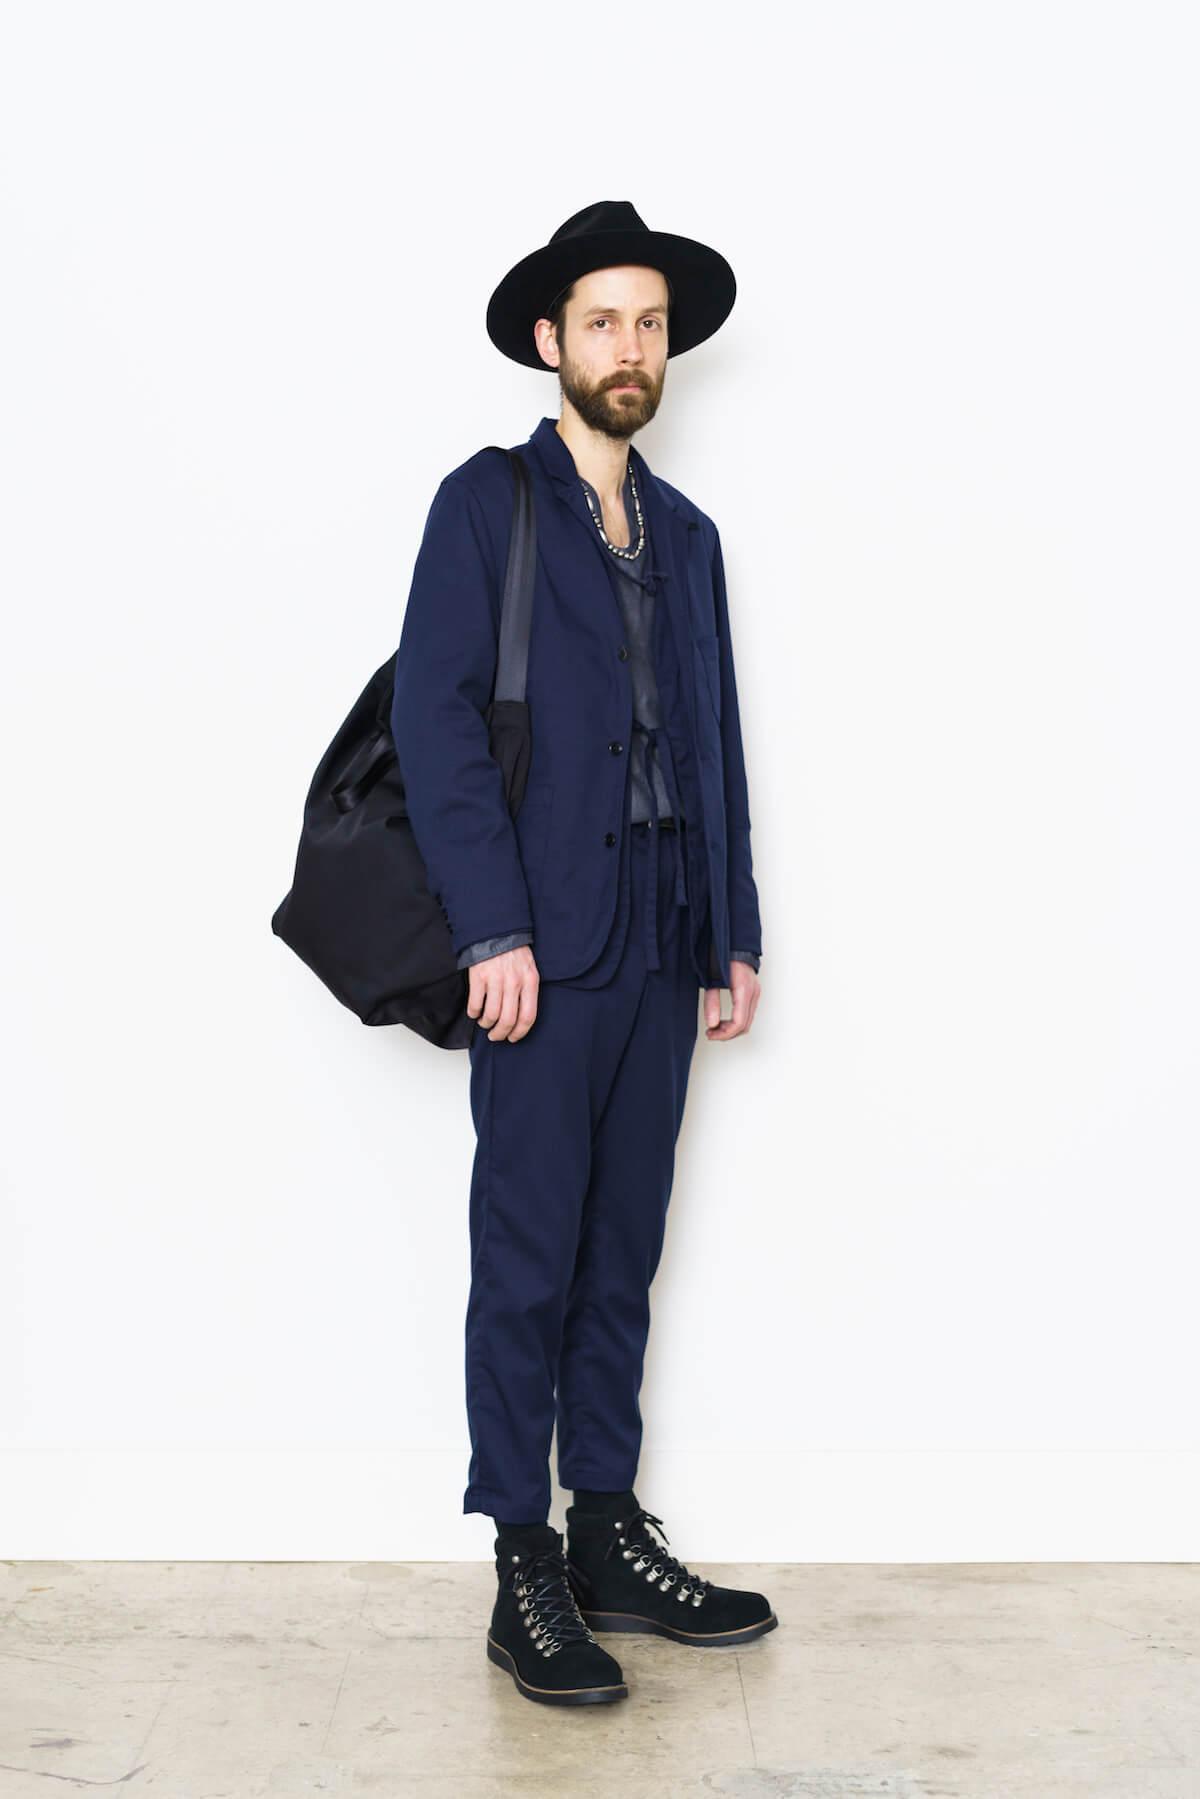 Black(黒/影)×Blank(白/空白)。ブランド「BLANCK」2018AWルックが公開! fashion_blanck_5